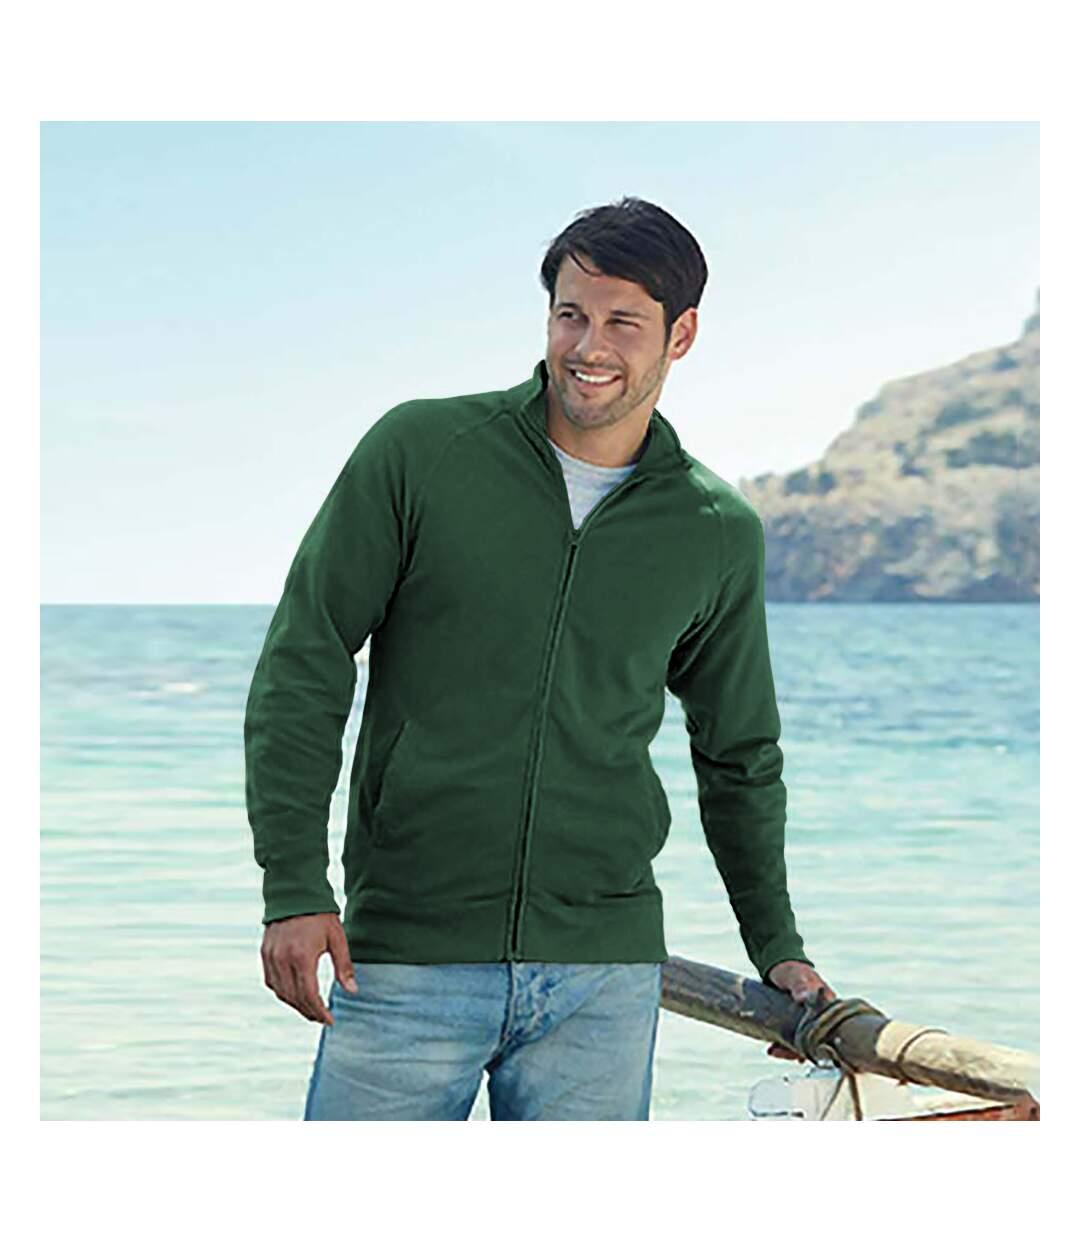 Fruit Of The Loom Mens Lightweight Full Zip Sweatshirt Jacket (White) - UTRW4500